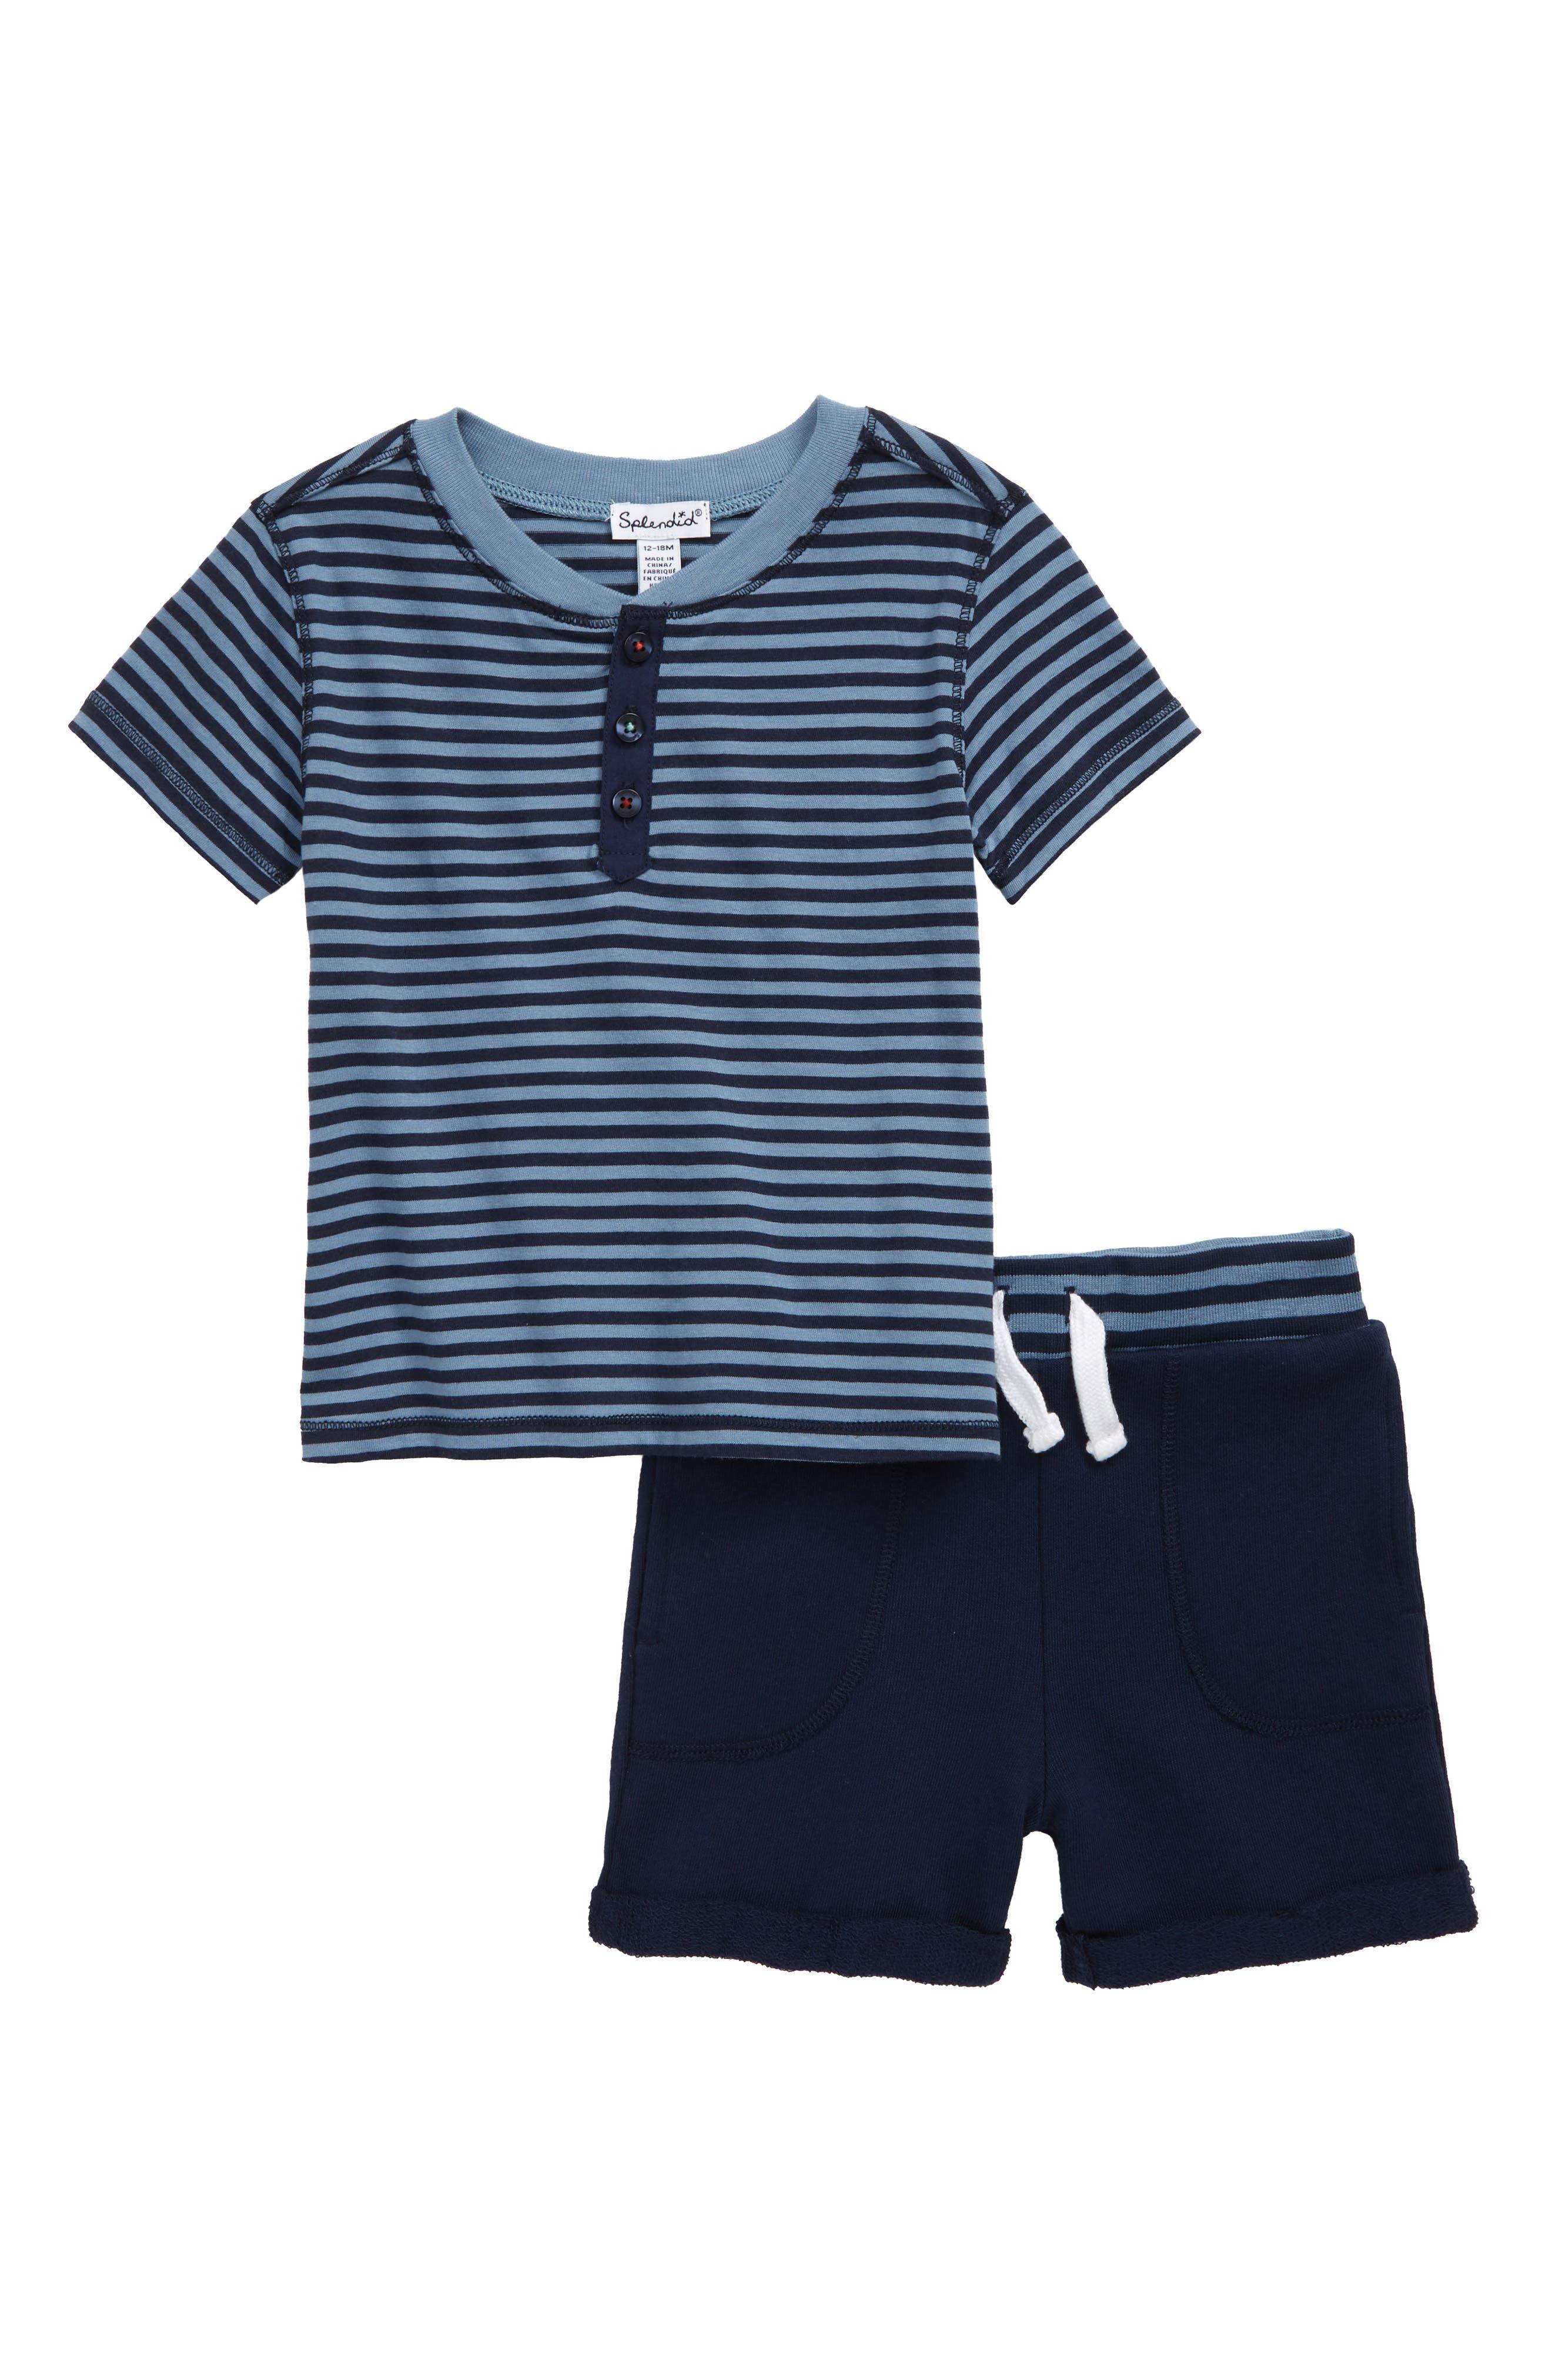 Image of Splendid Yarn Dye Stripe Henley & Shorts Set